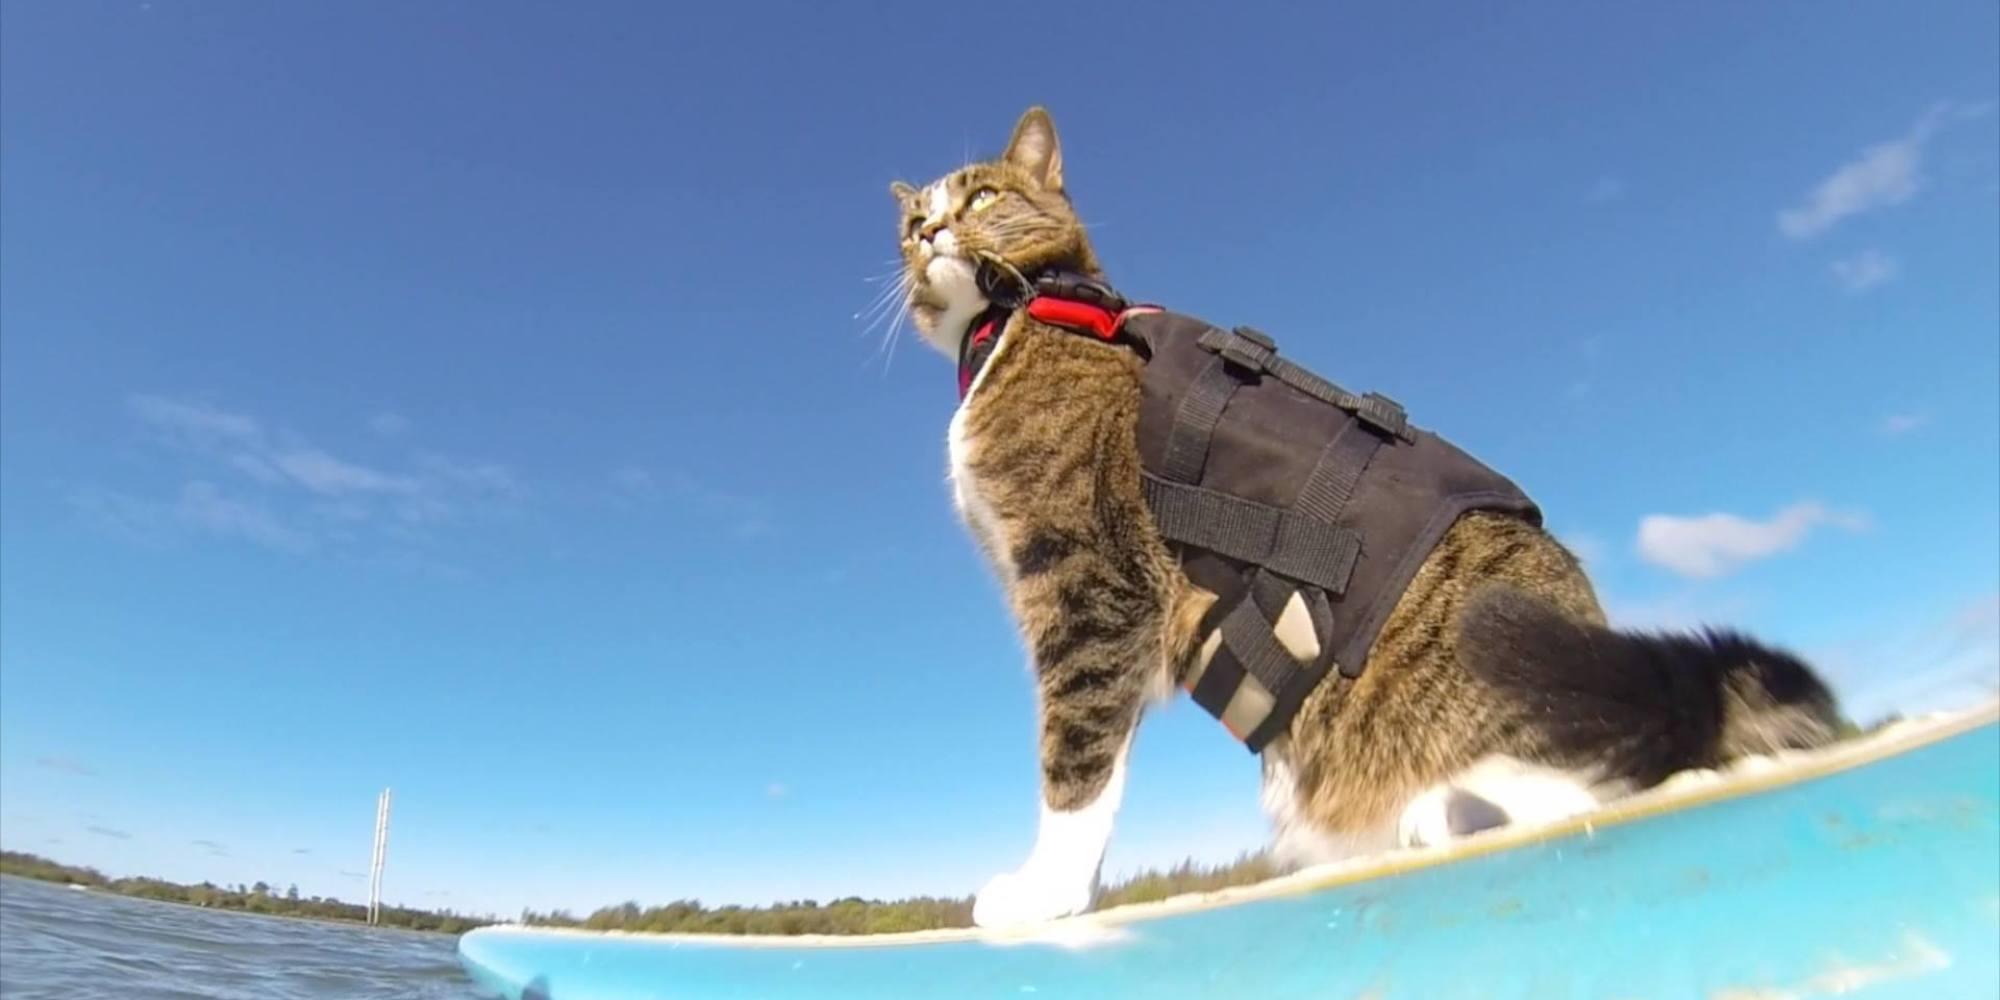 Skateboarding Cat Video